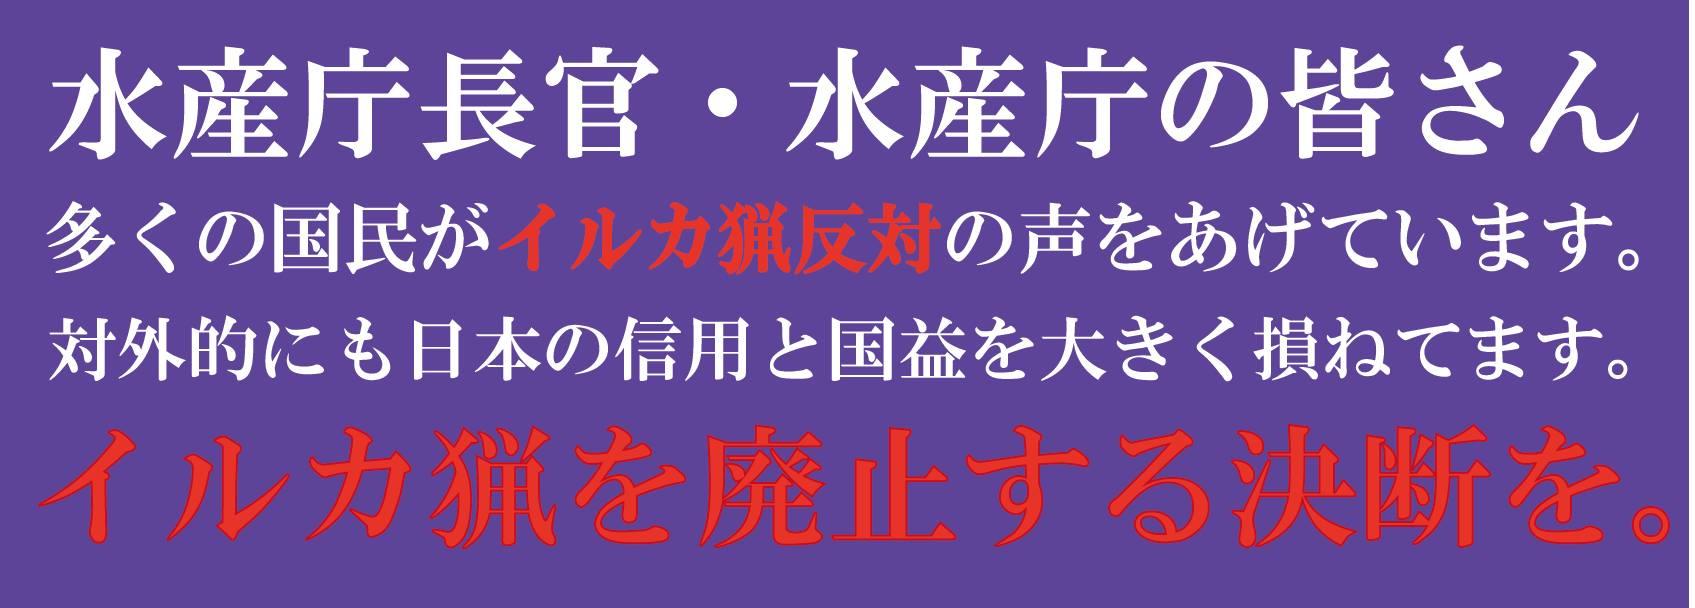 irukaryo_20131004040423f58.jpg